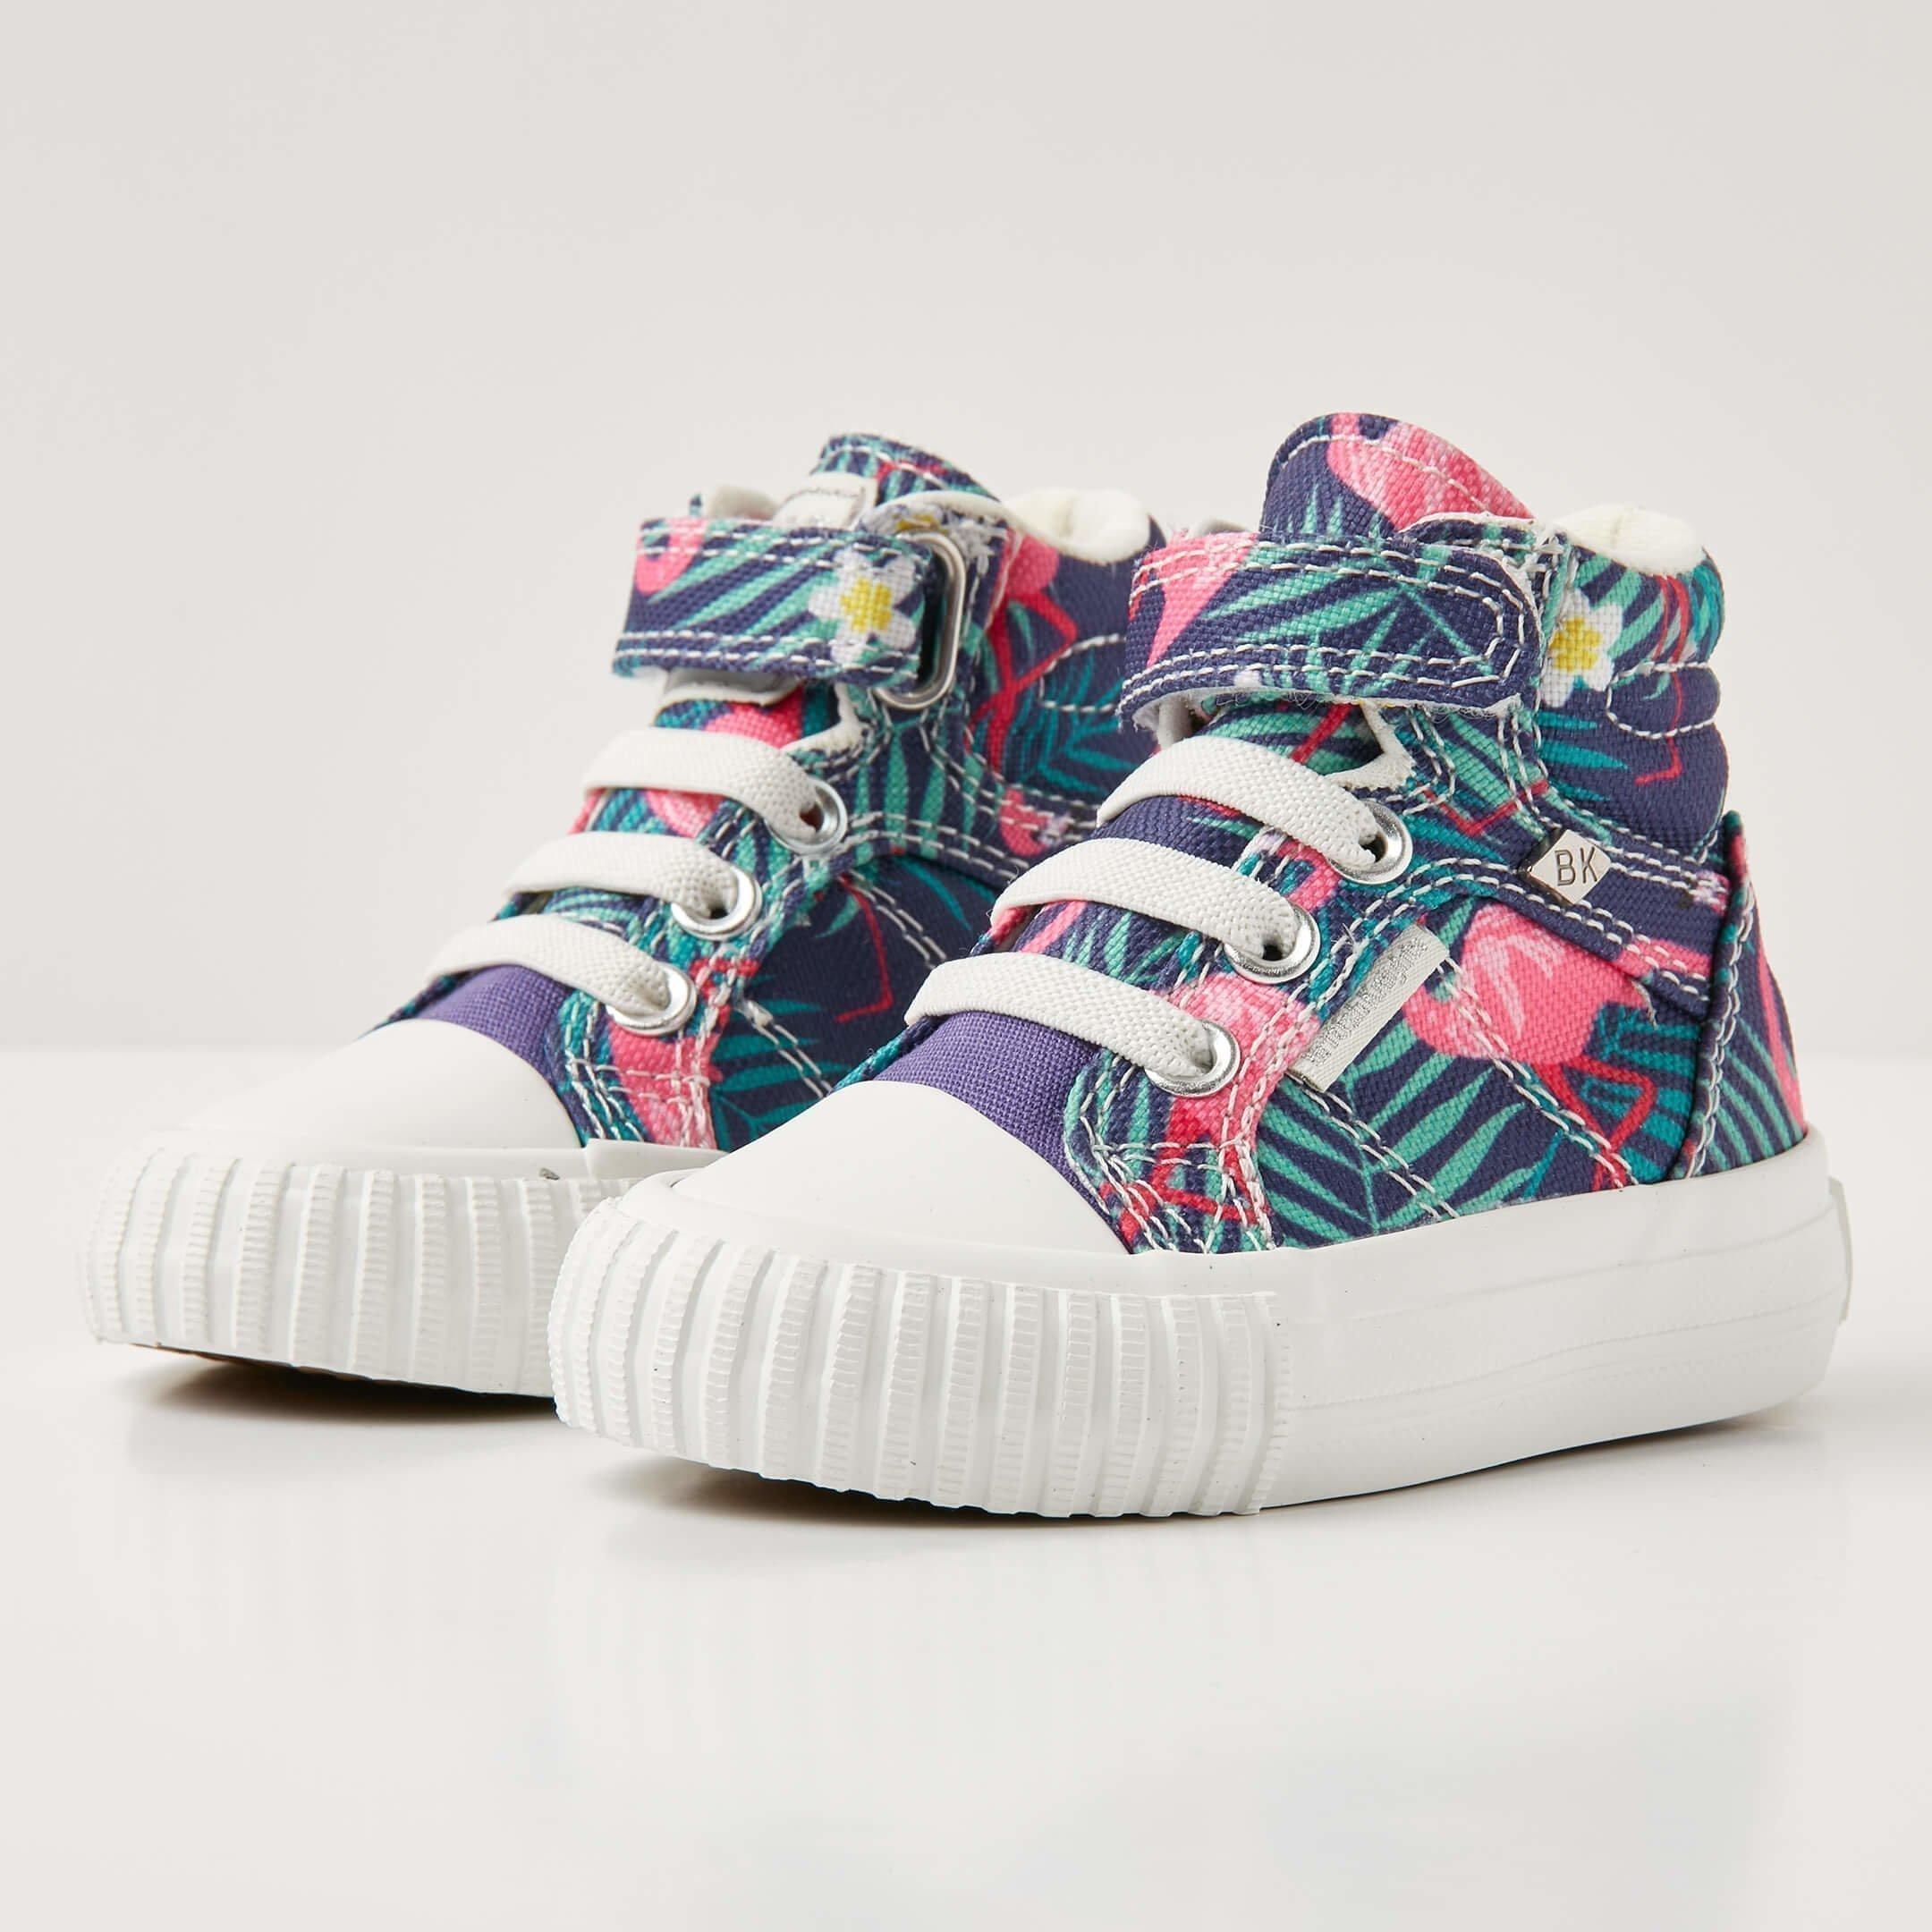 5aec7a27349 British Knights dee baby meisjes sneakers hoog – roze flamingo – maat 21  (blauw). British Knights dee baby meisjes sneakers hoog – roze flamingo – maat  21 ...